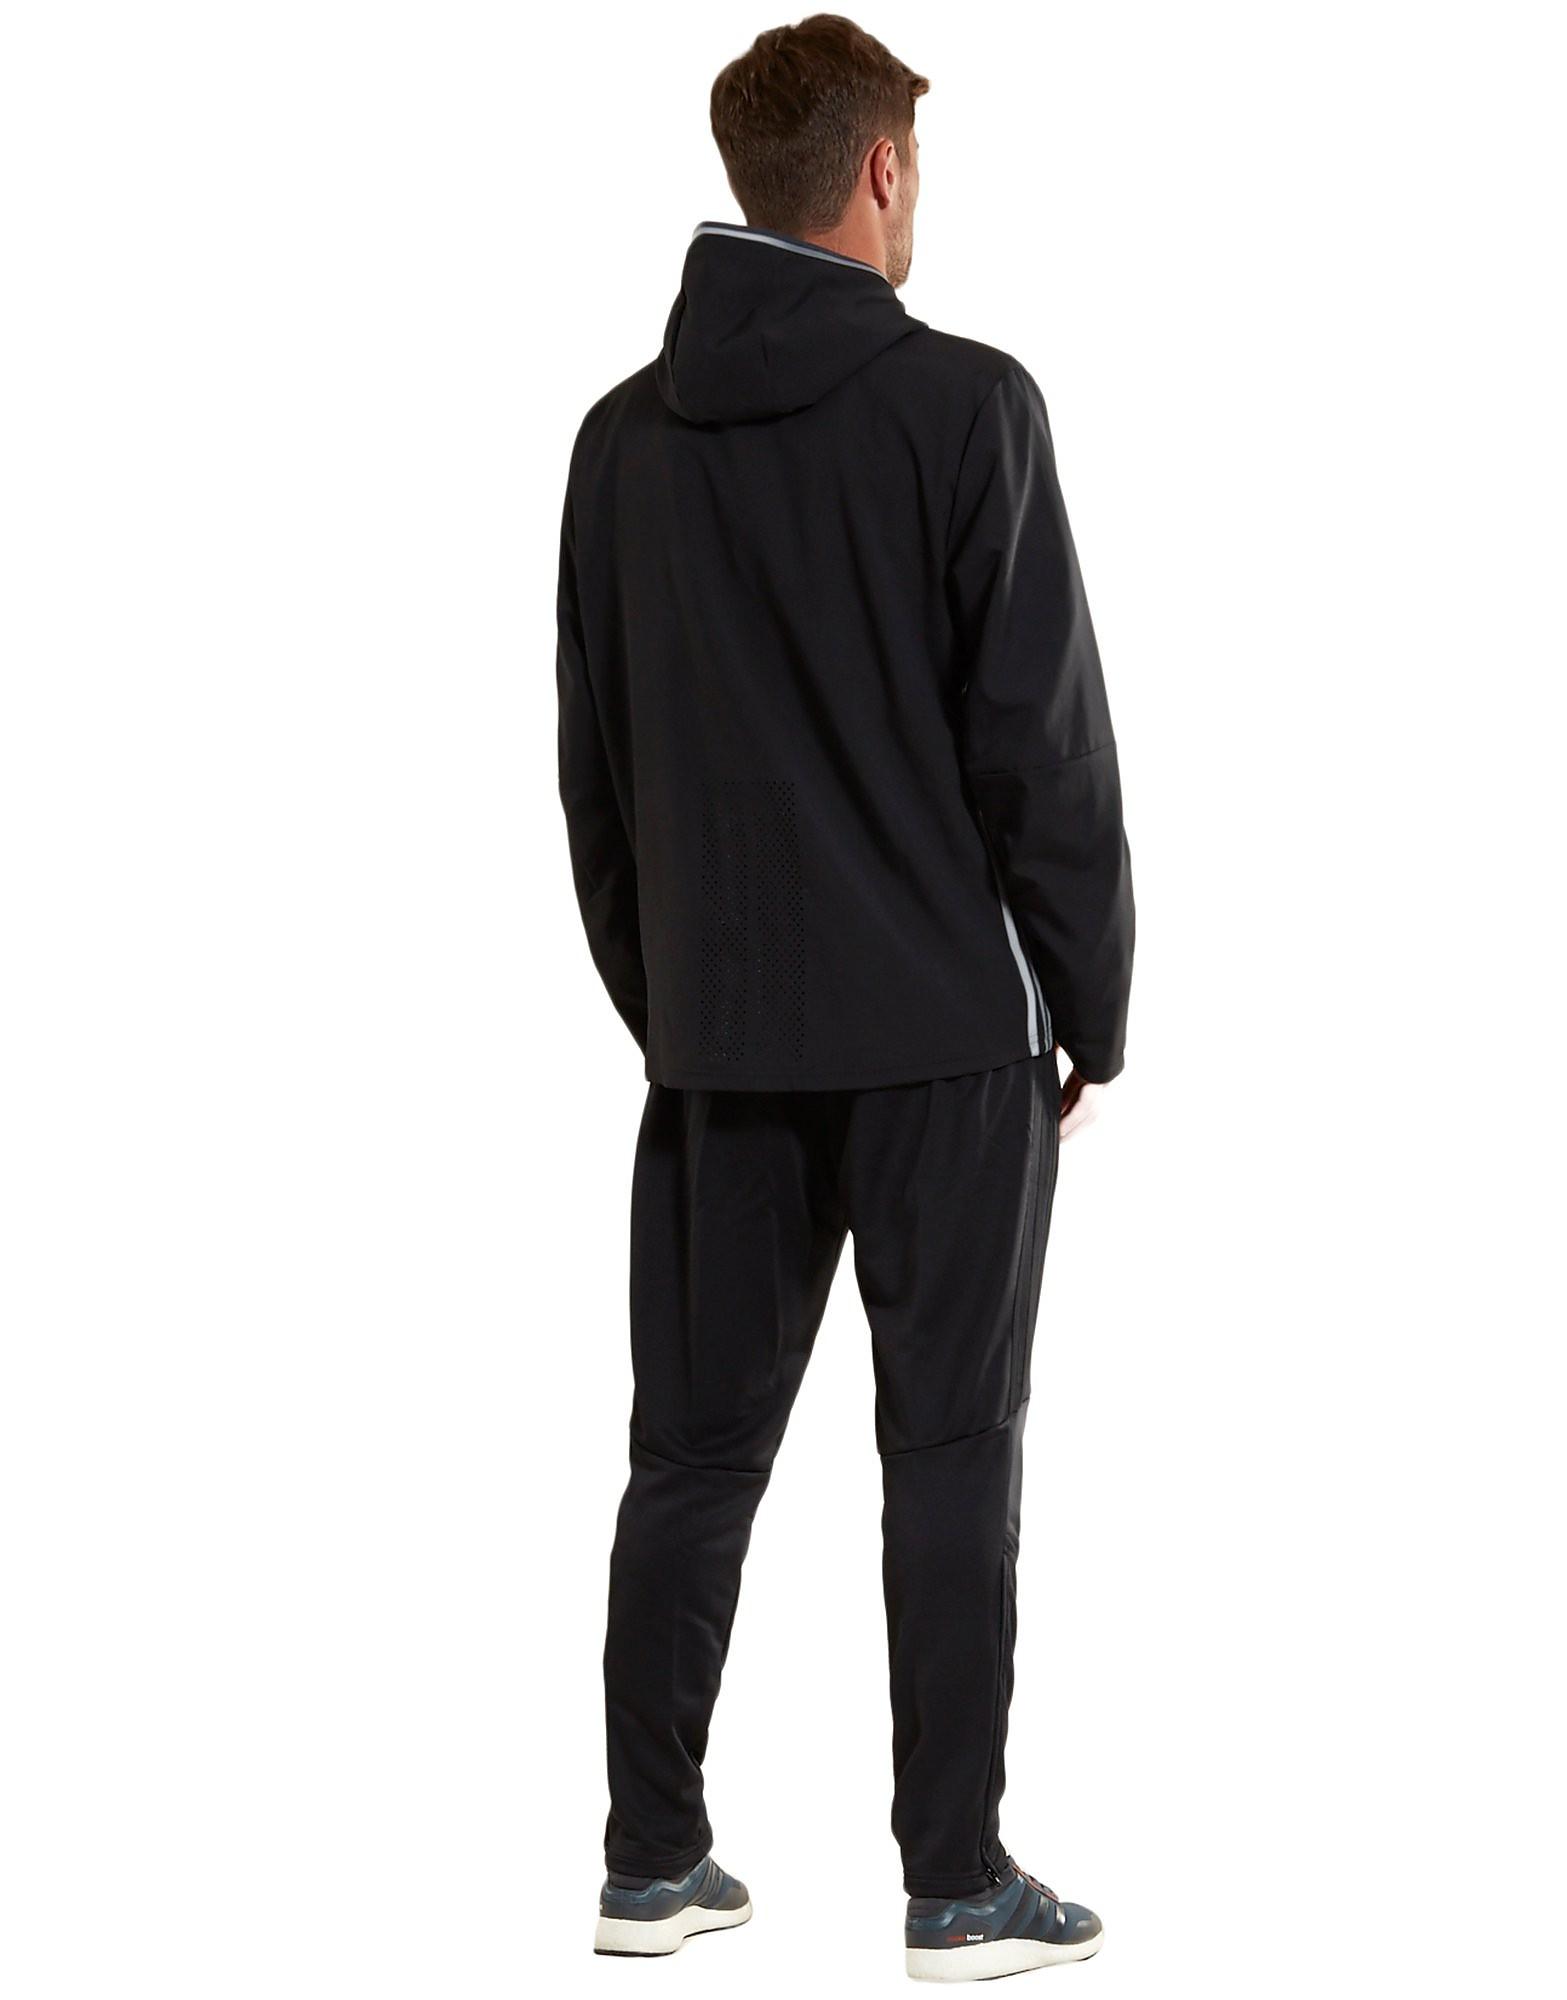 adidas Wales 2016/17 Presentation Suit